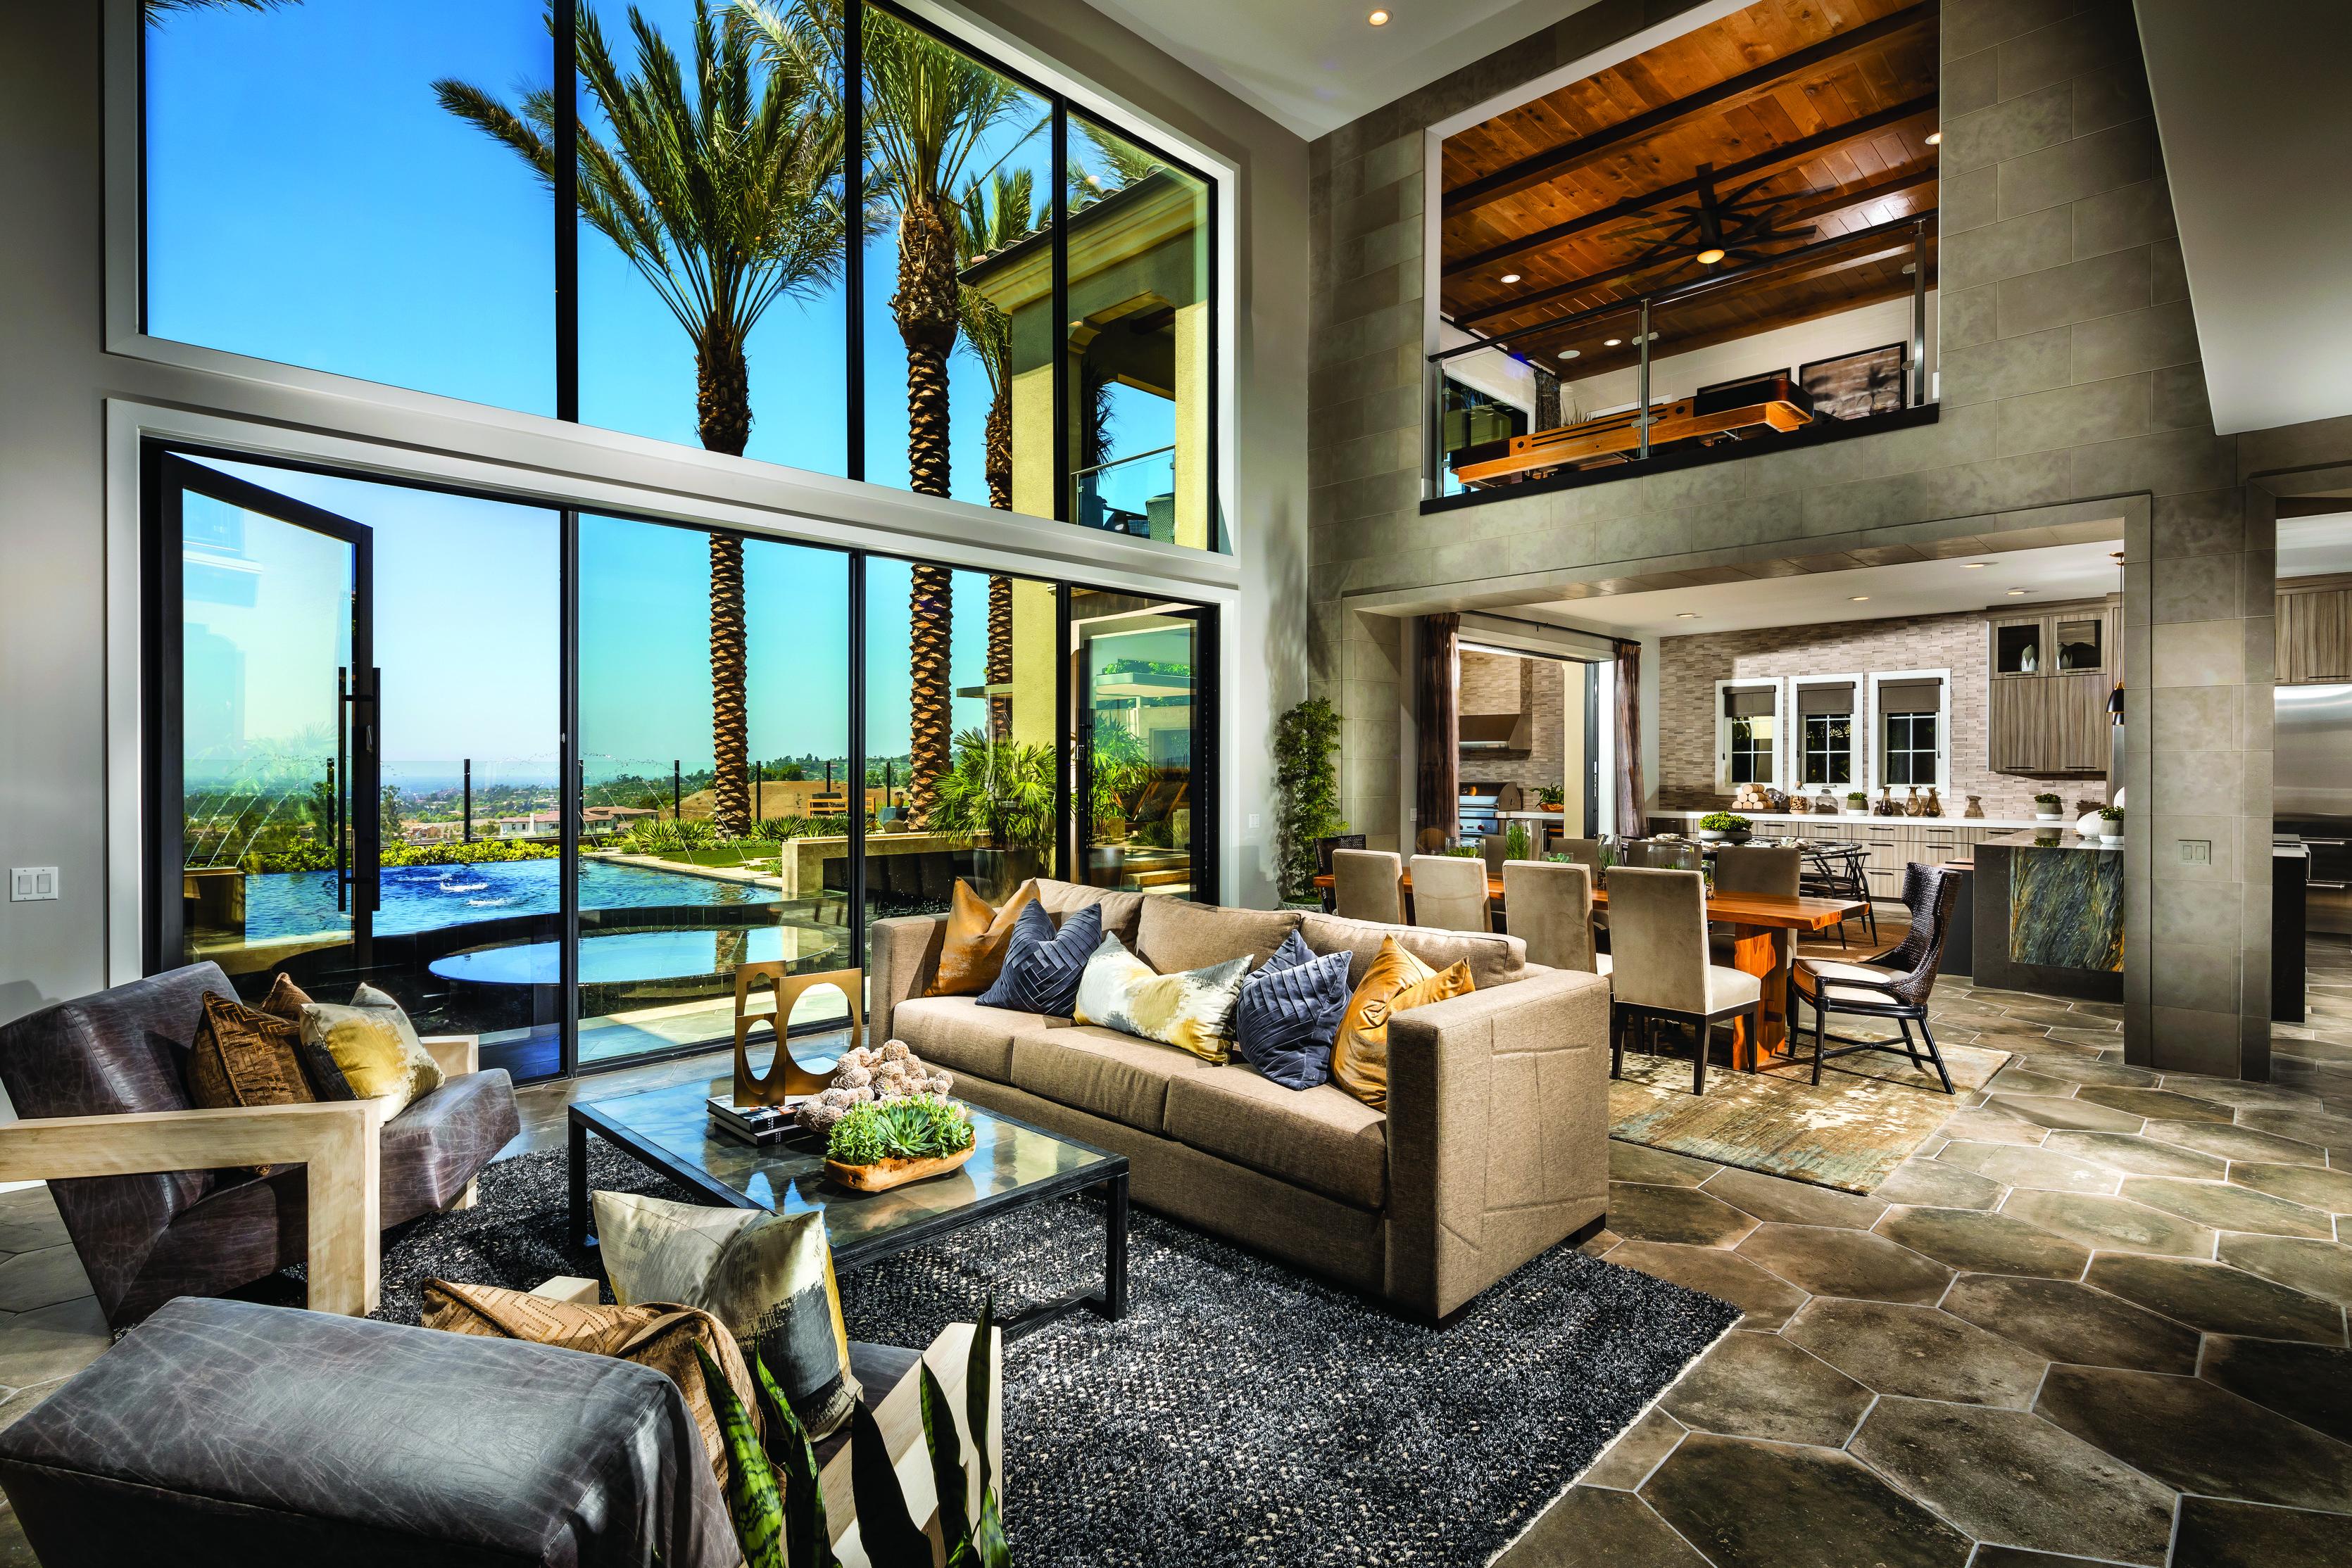 Modern, luxurious home layout.